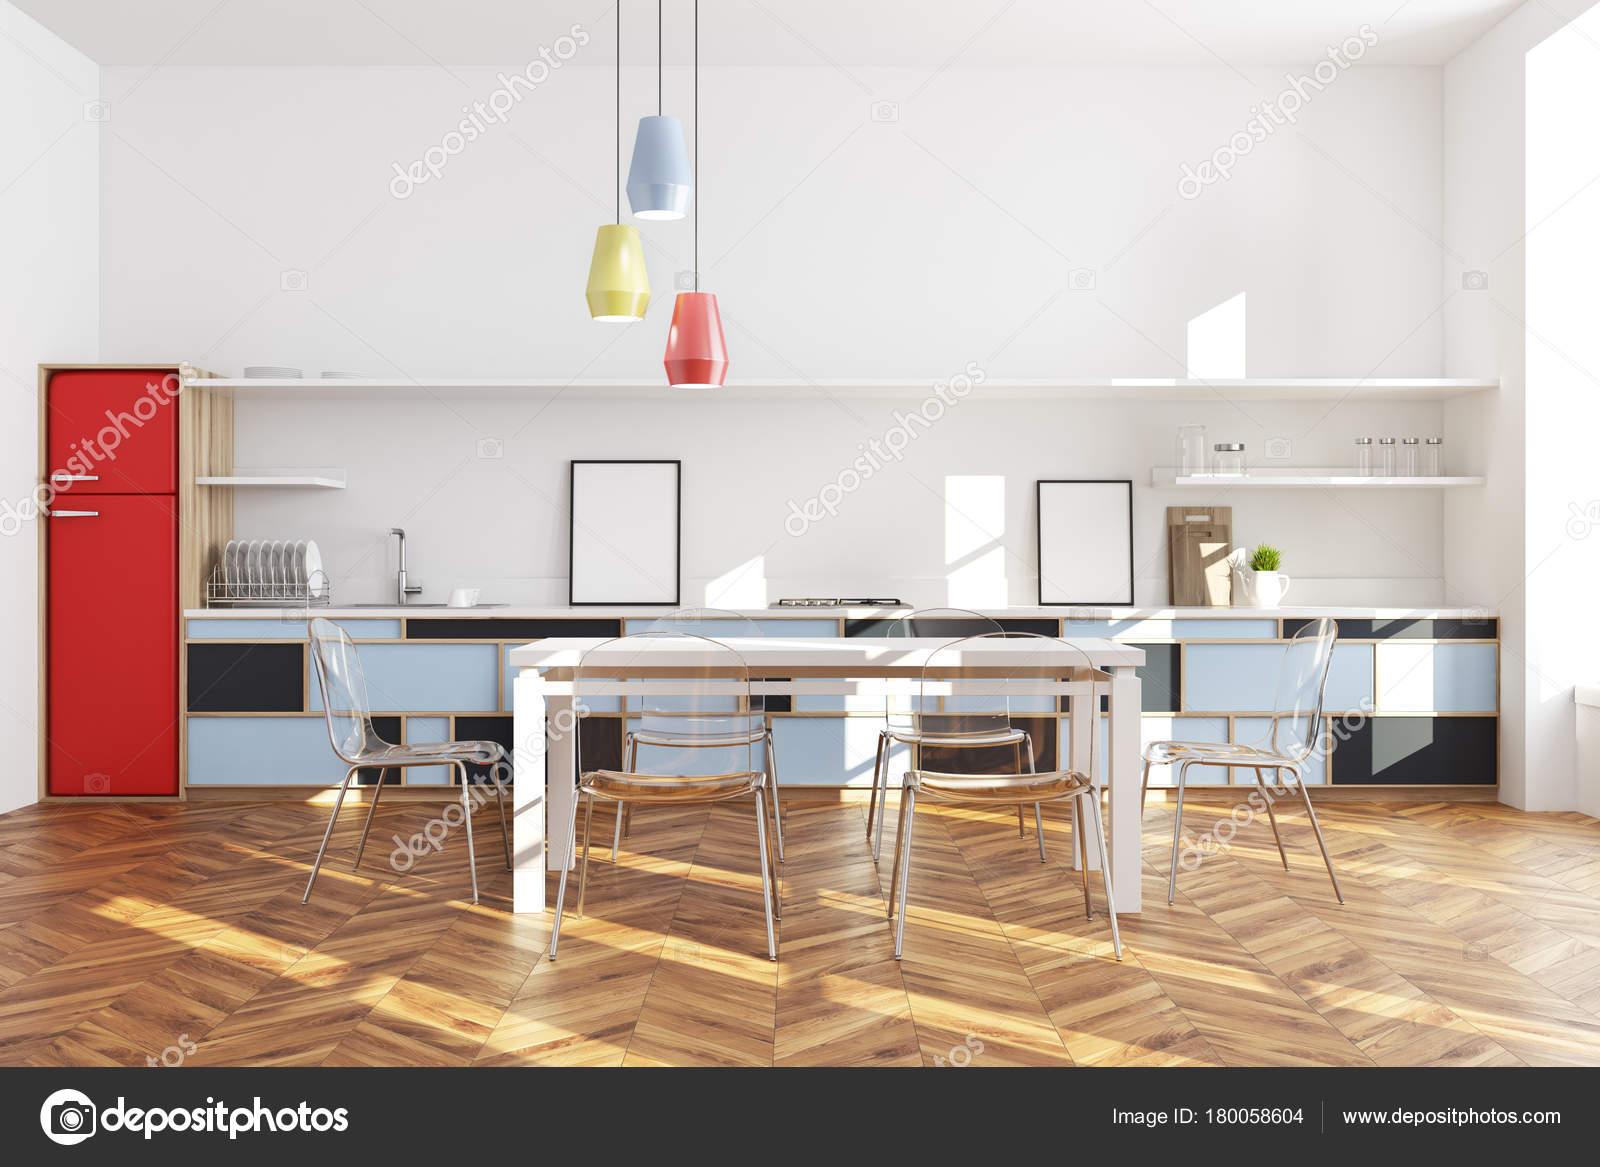 Knallrote Kühlschrank Küche Interieur — Stockfoto © denisismagilov ...